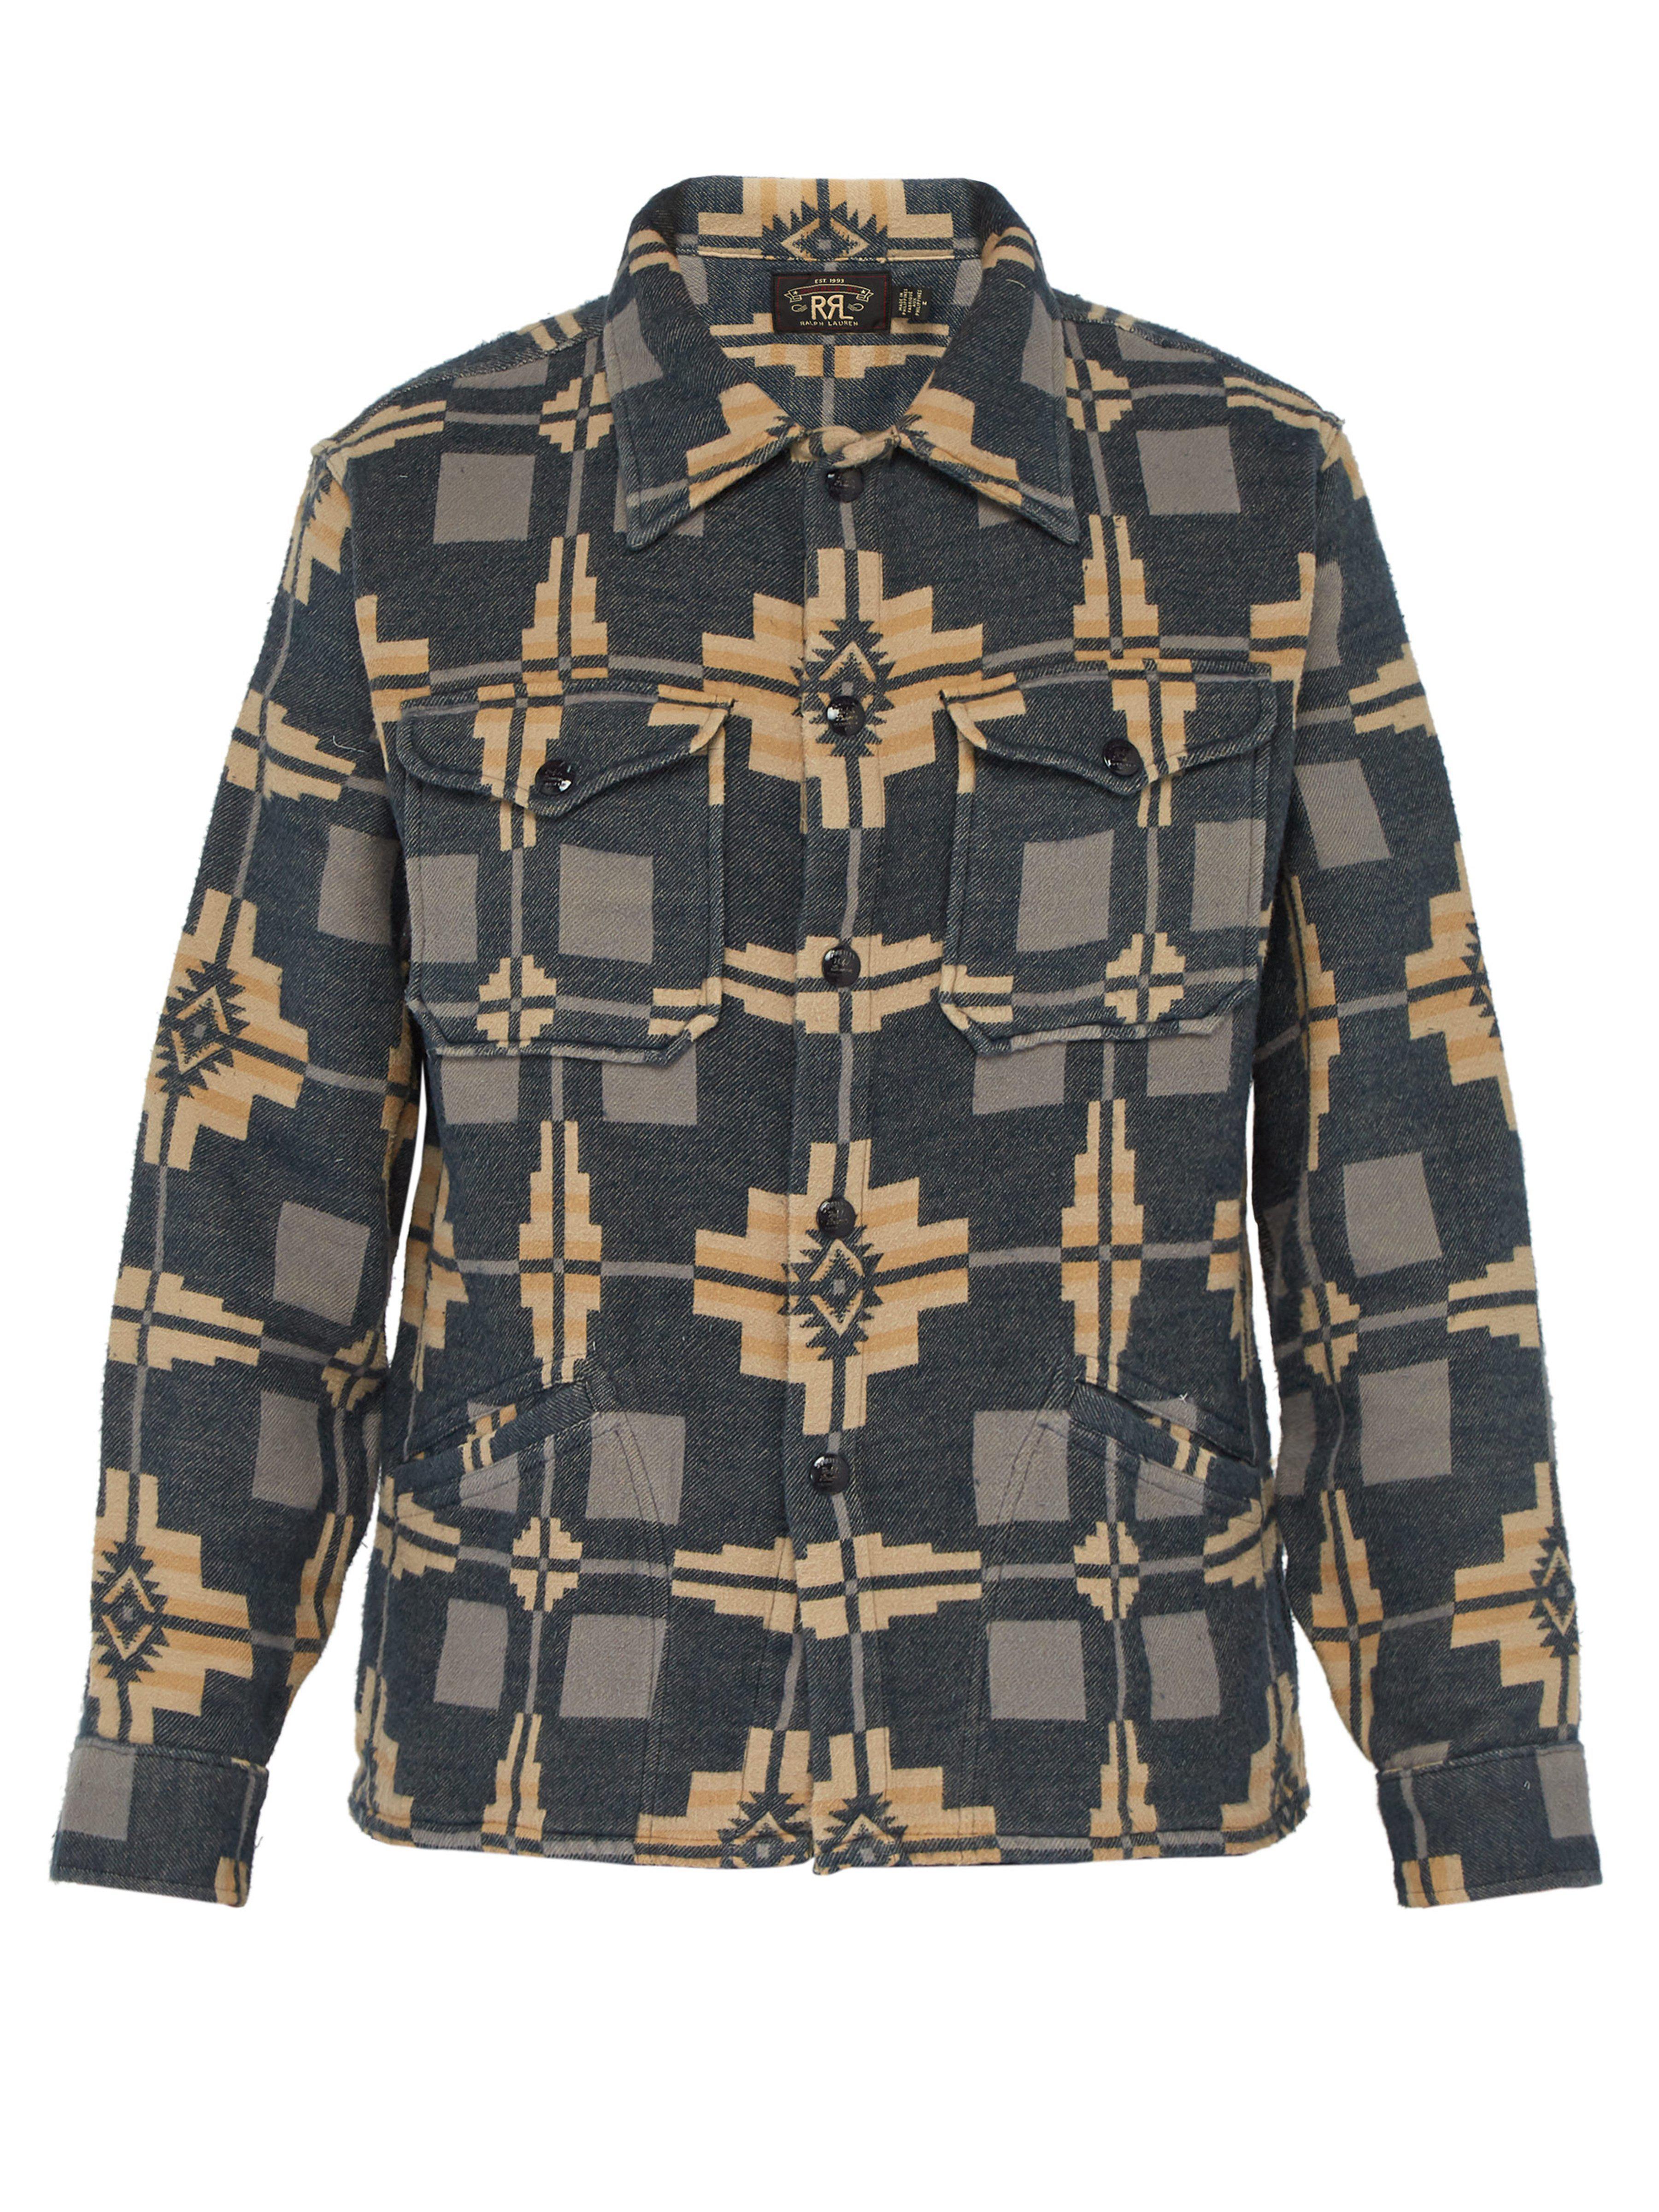 c83242cc RRL Jacquard Cotton Overshirt in Blue for Men - Lyst